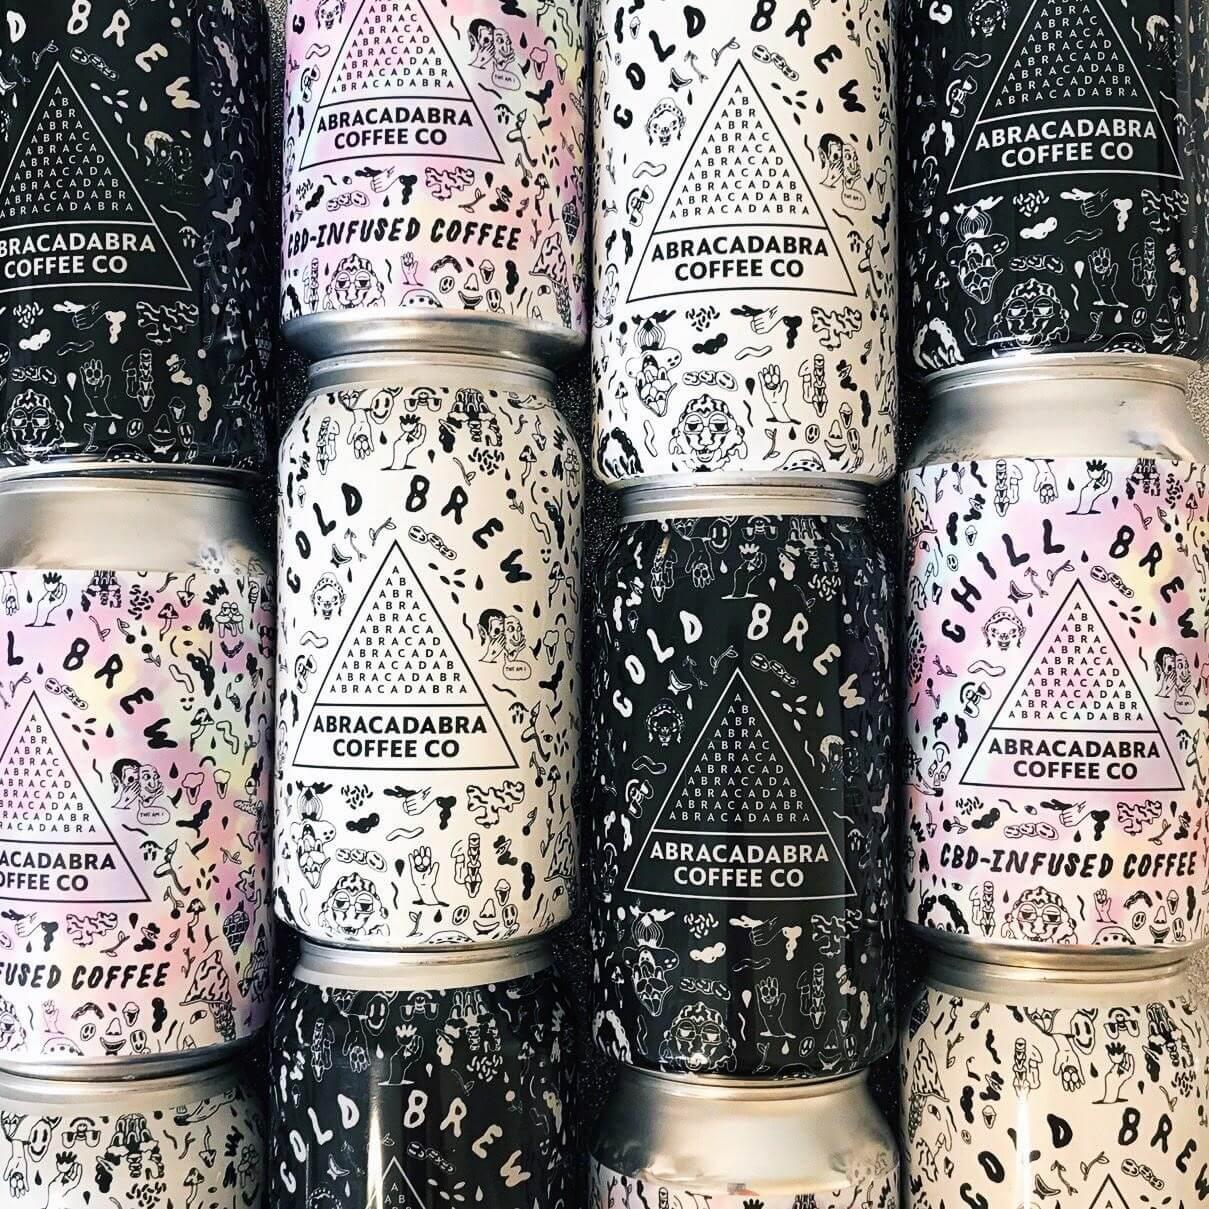 Abracadabra Coffee Co.